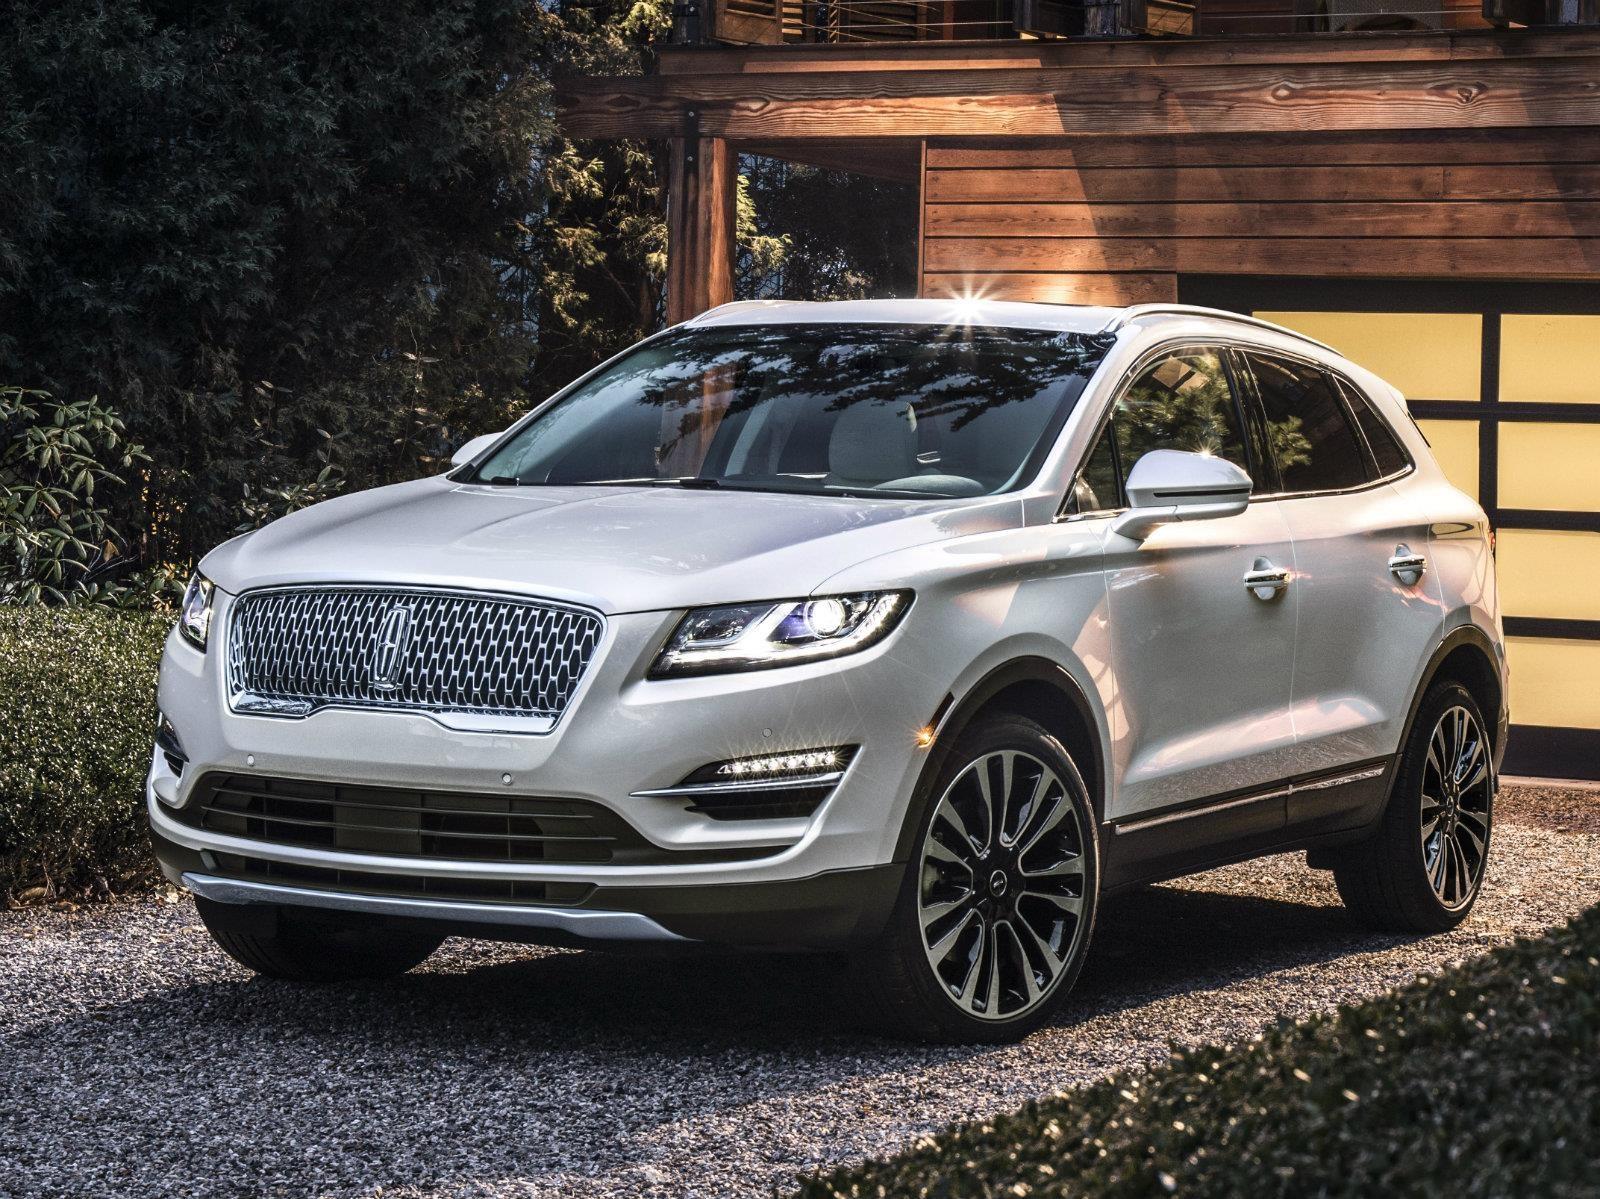 Lincoln MKC 2019 es actualizada con buen gusto